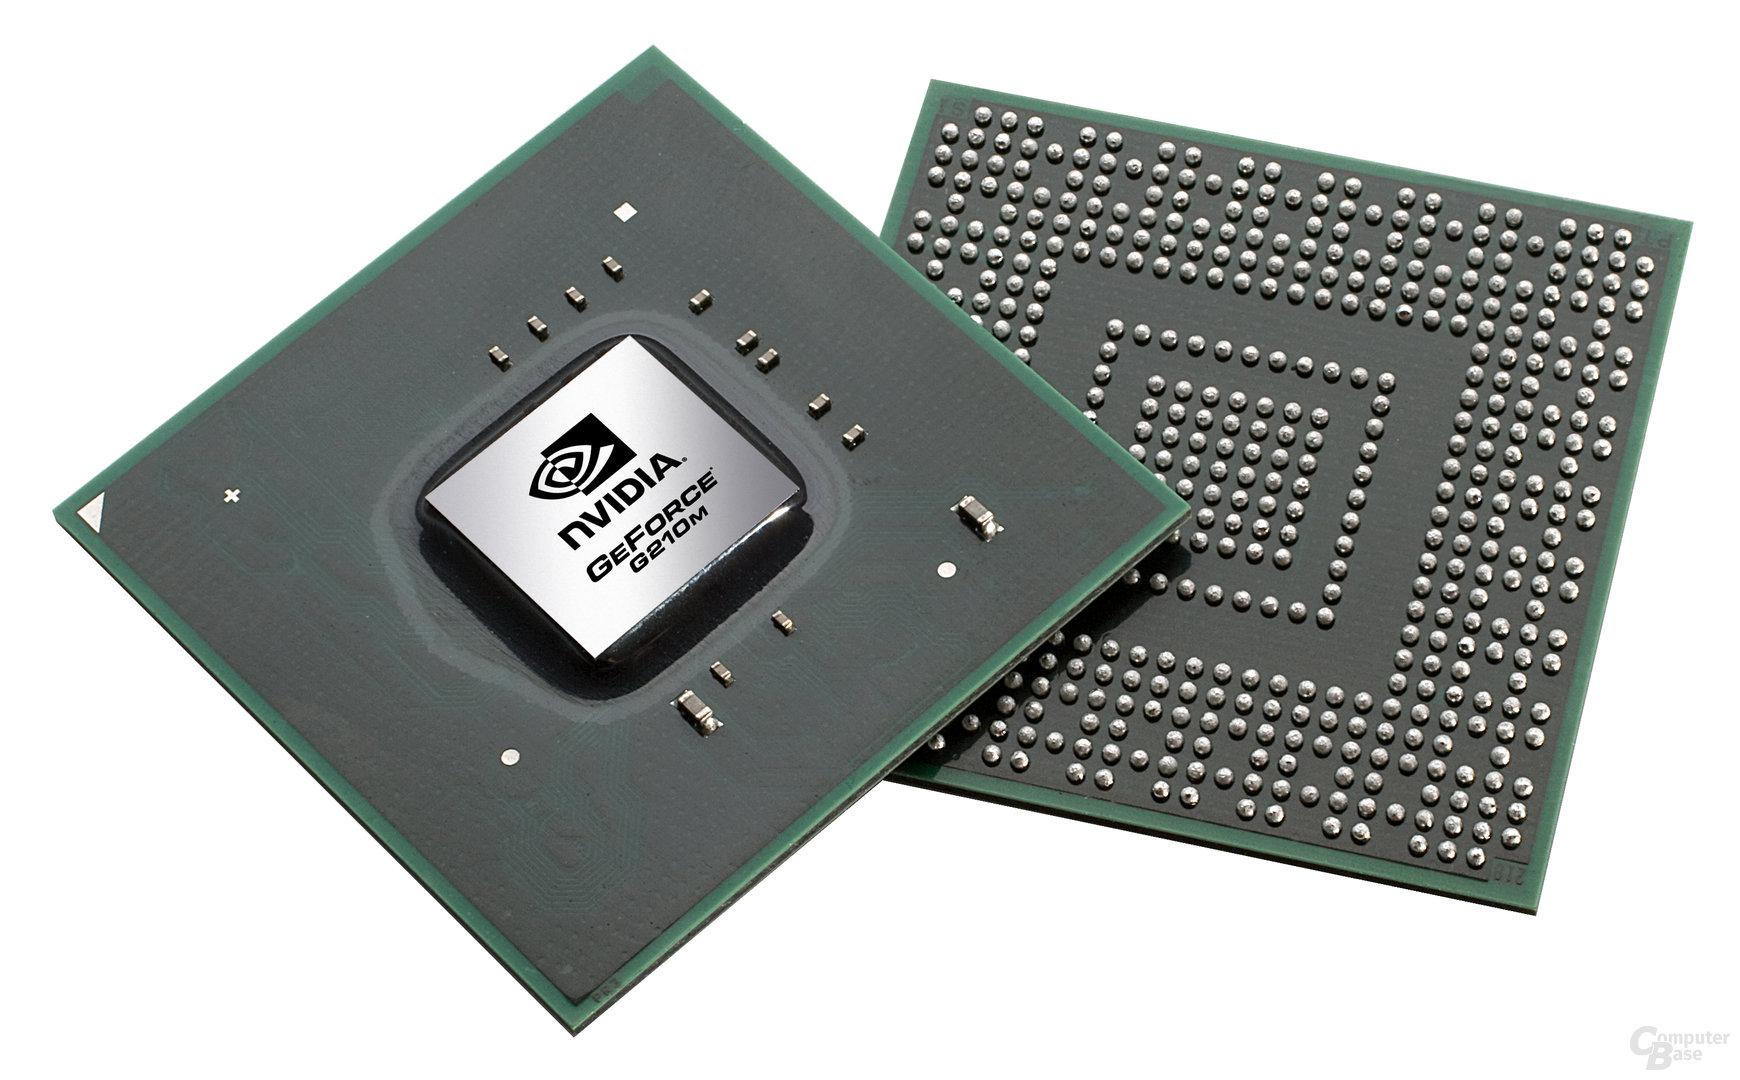 GeForce G210M small